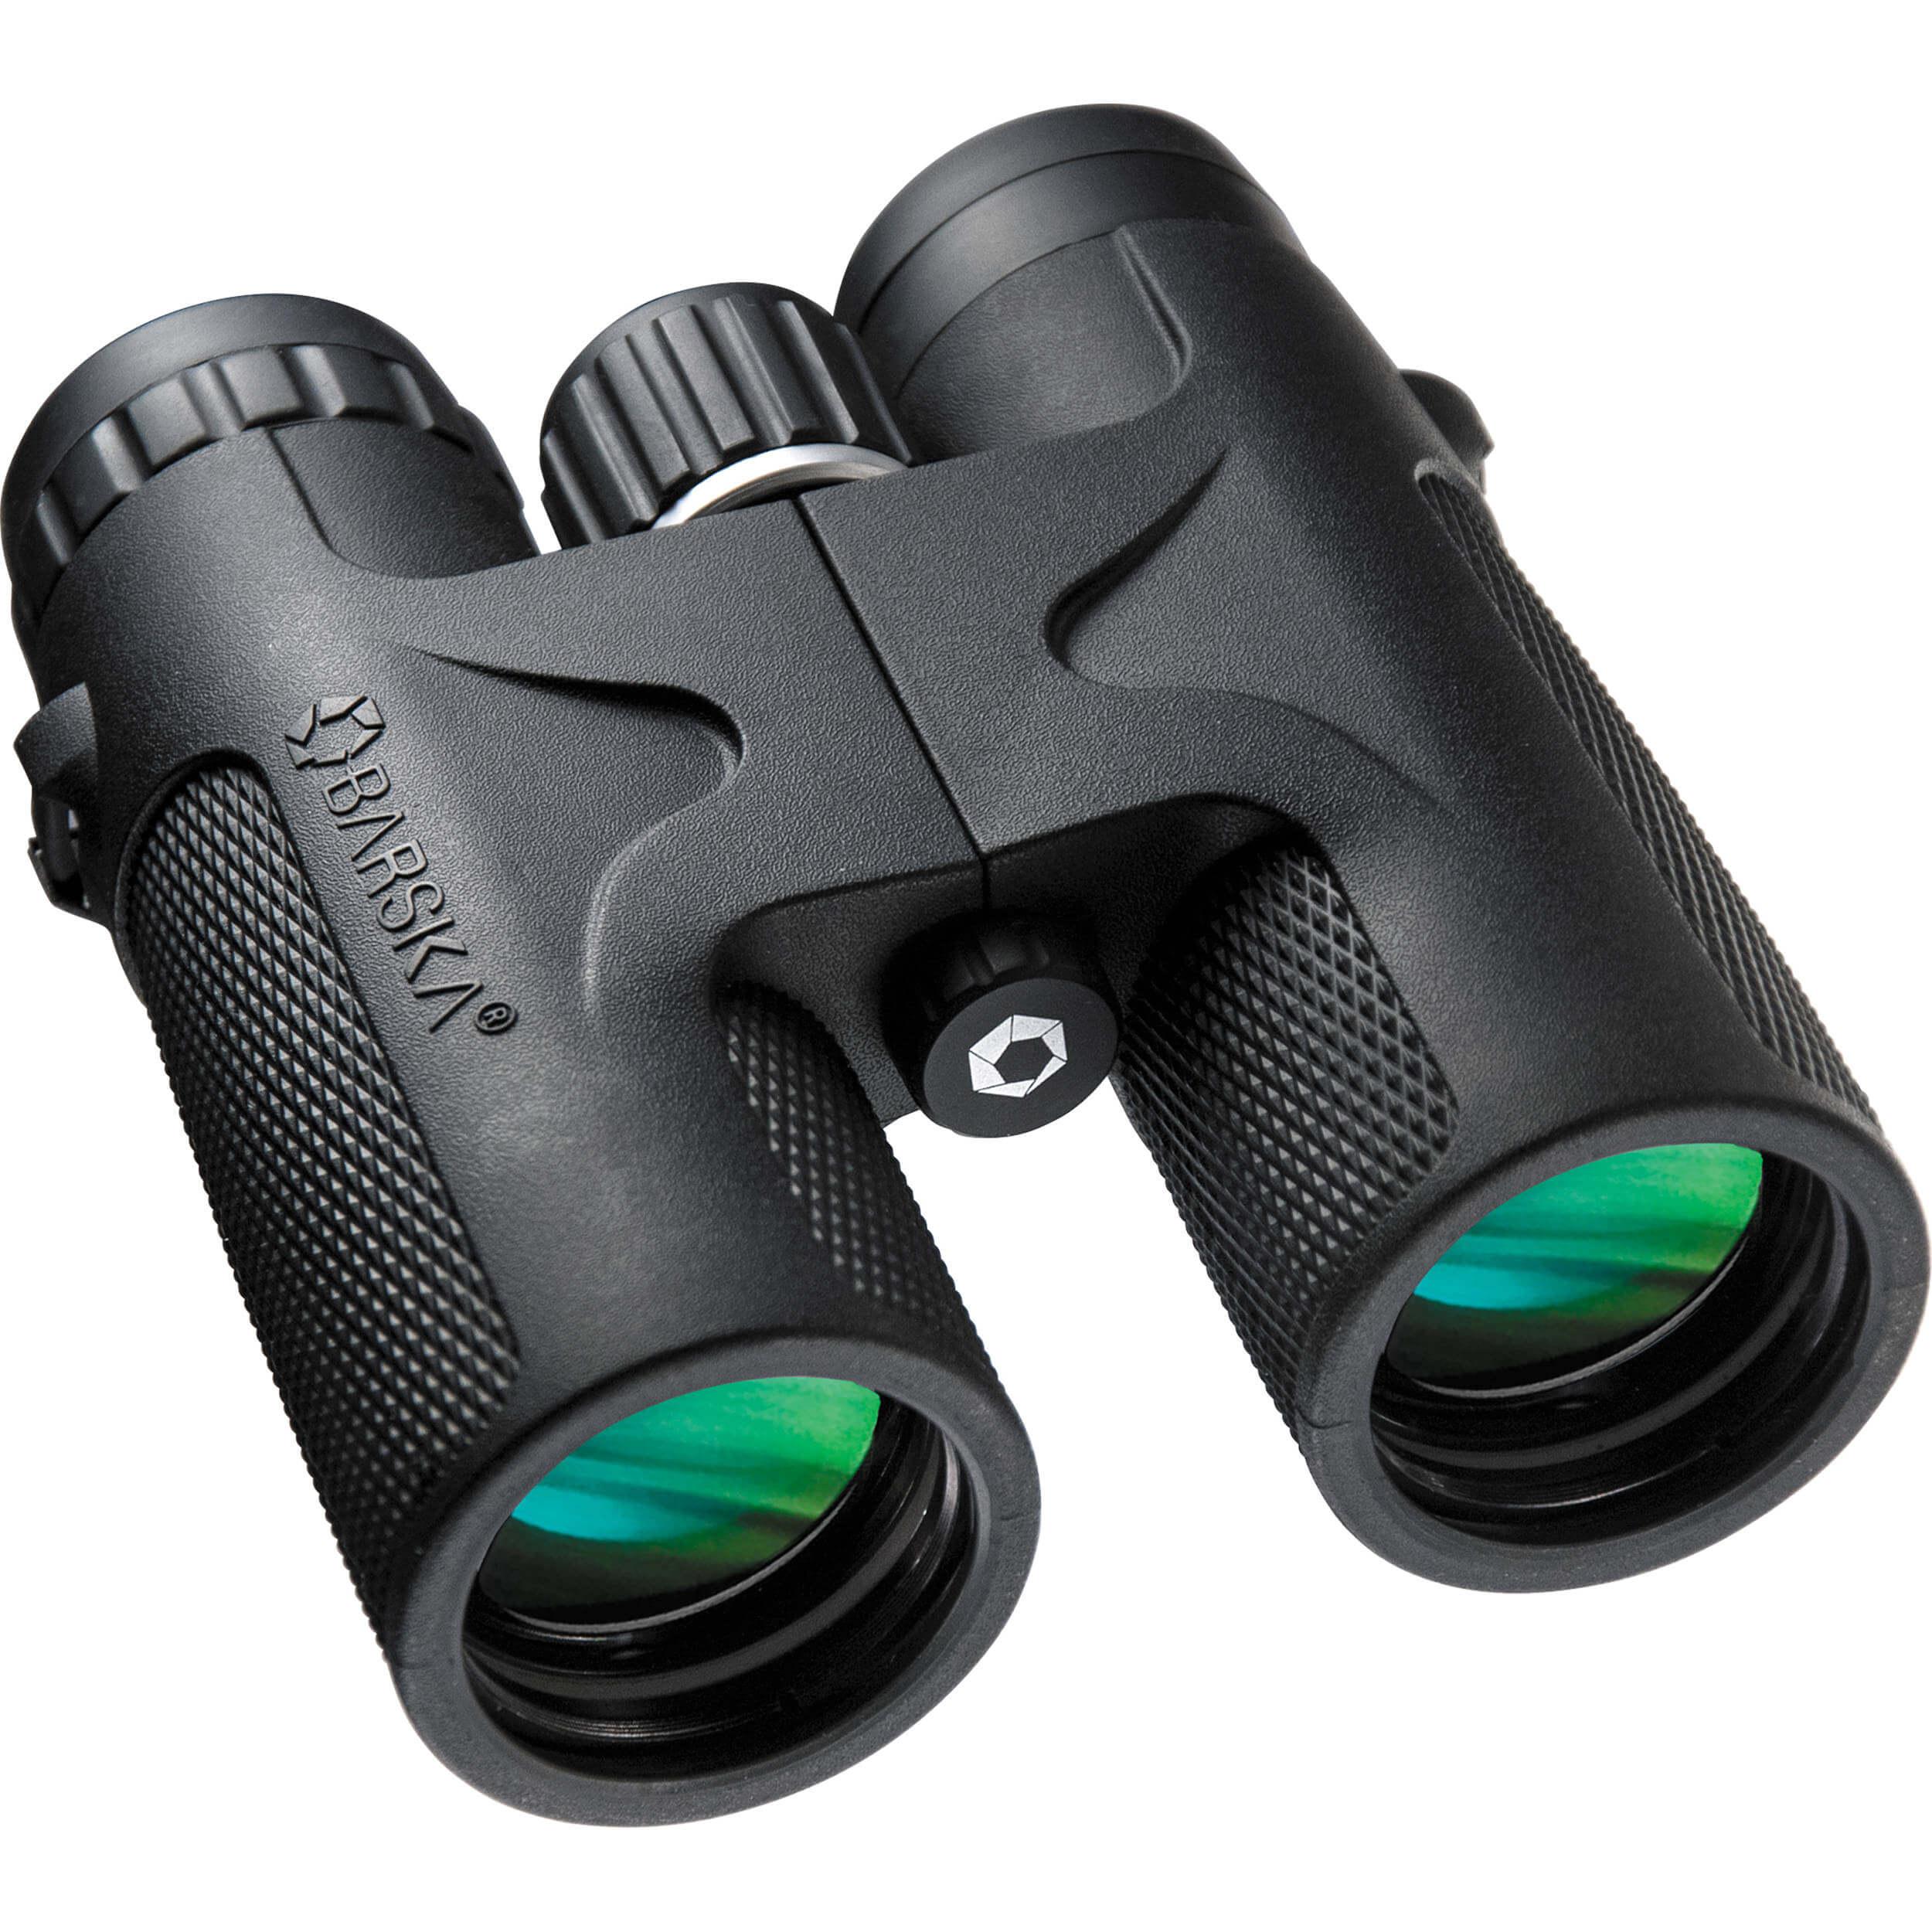 12x42 WP Blackhawk Binoculars